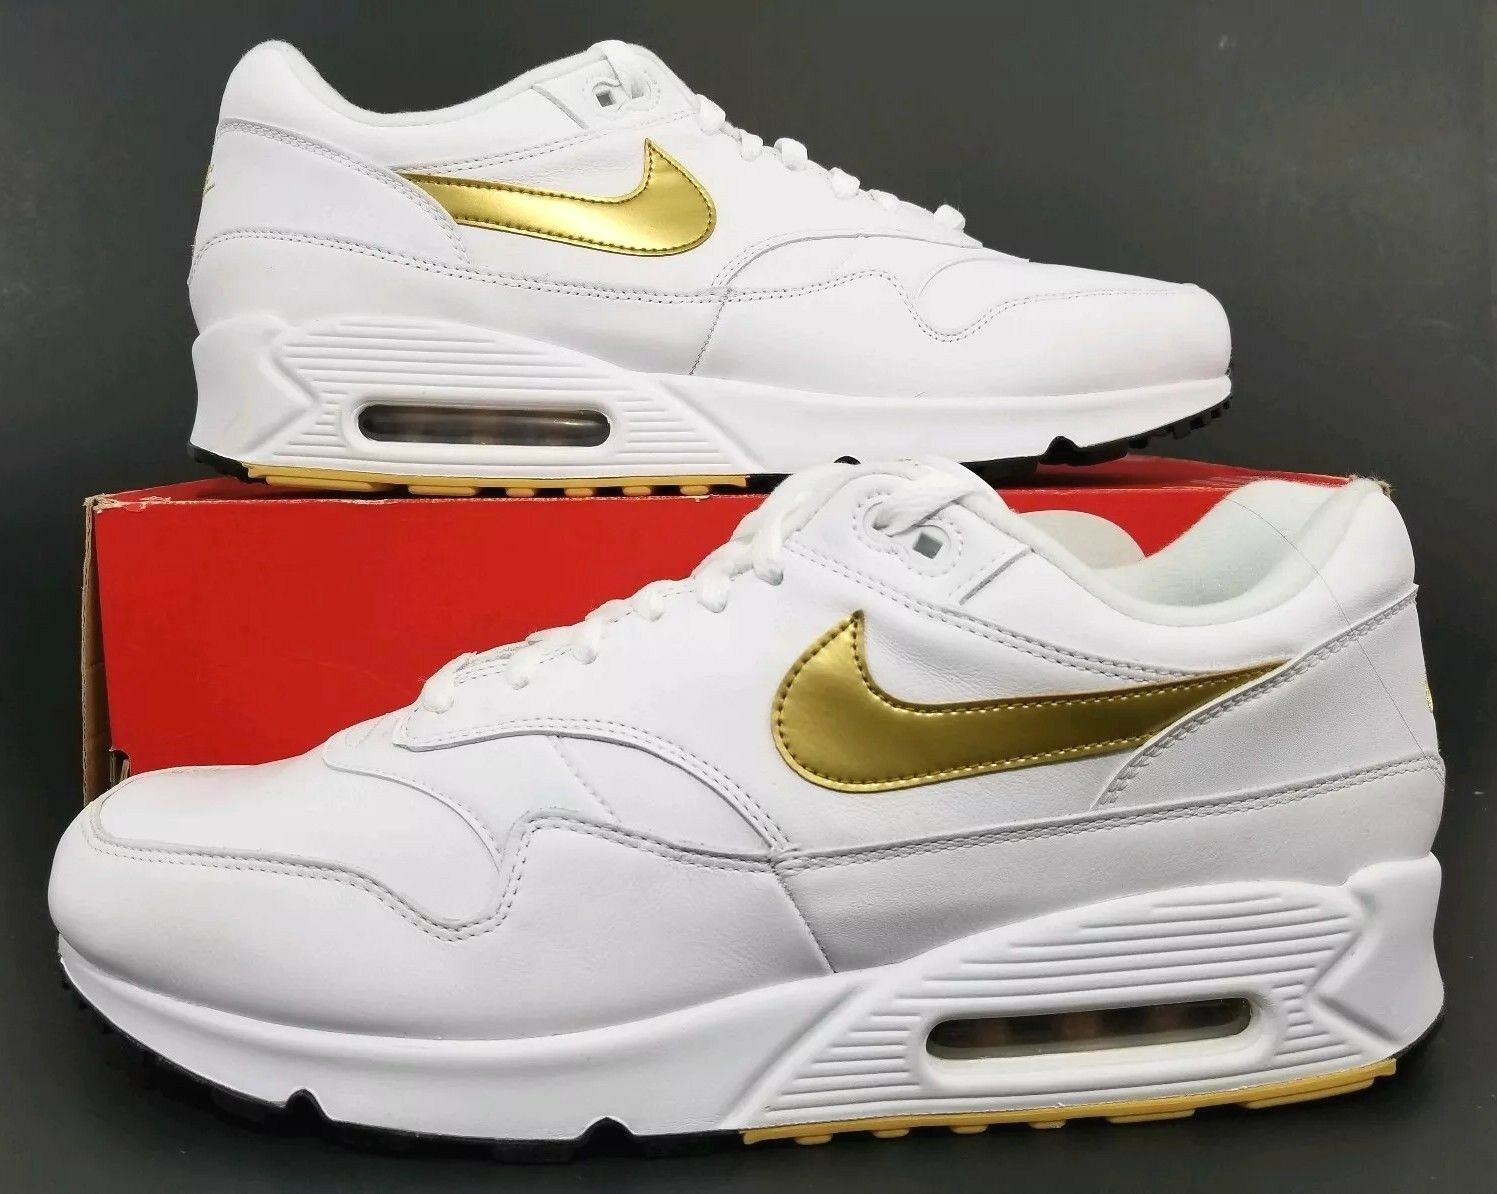 separation shoes 246c6 0575d Nike Air Max 90 1 White Metallic Metallic Metallic gold Black AJ7695-102  Men s Size